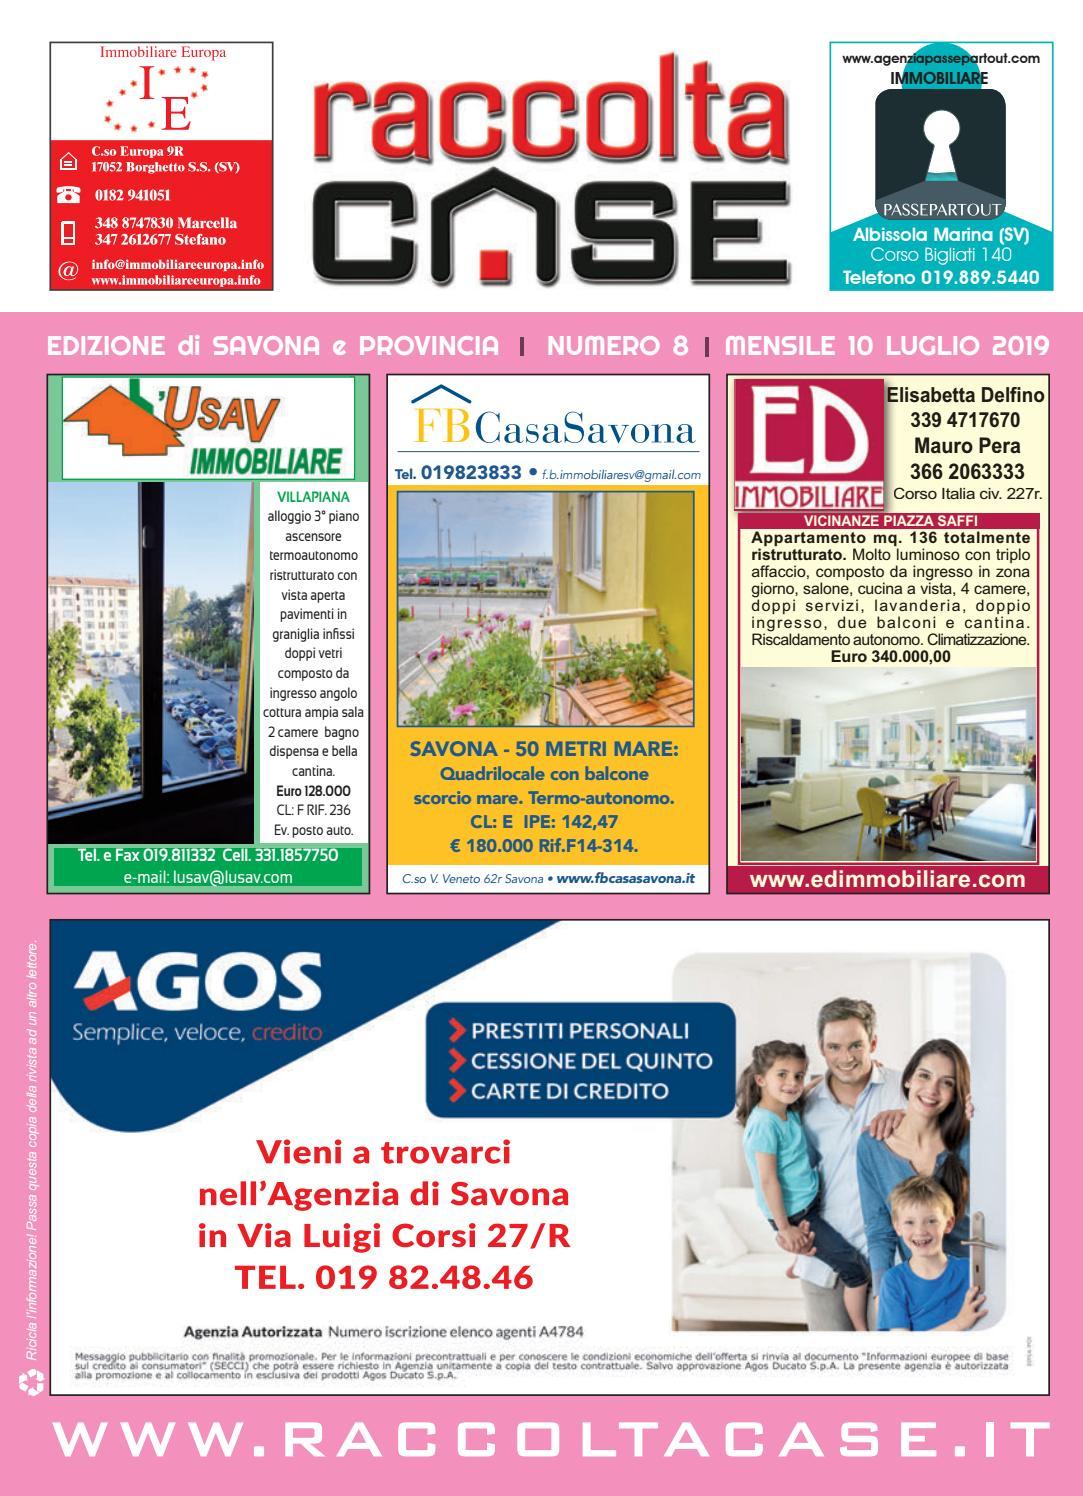 Architetti Savona Elenco raccoltacase savona 8 - 2019 by publidok s.r.l. - issuu